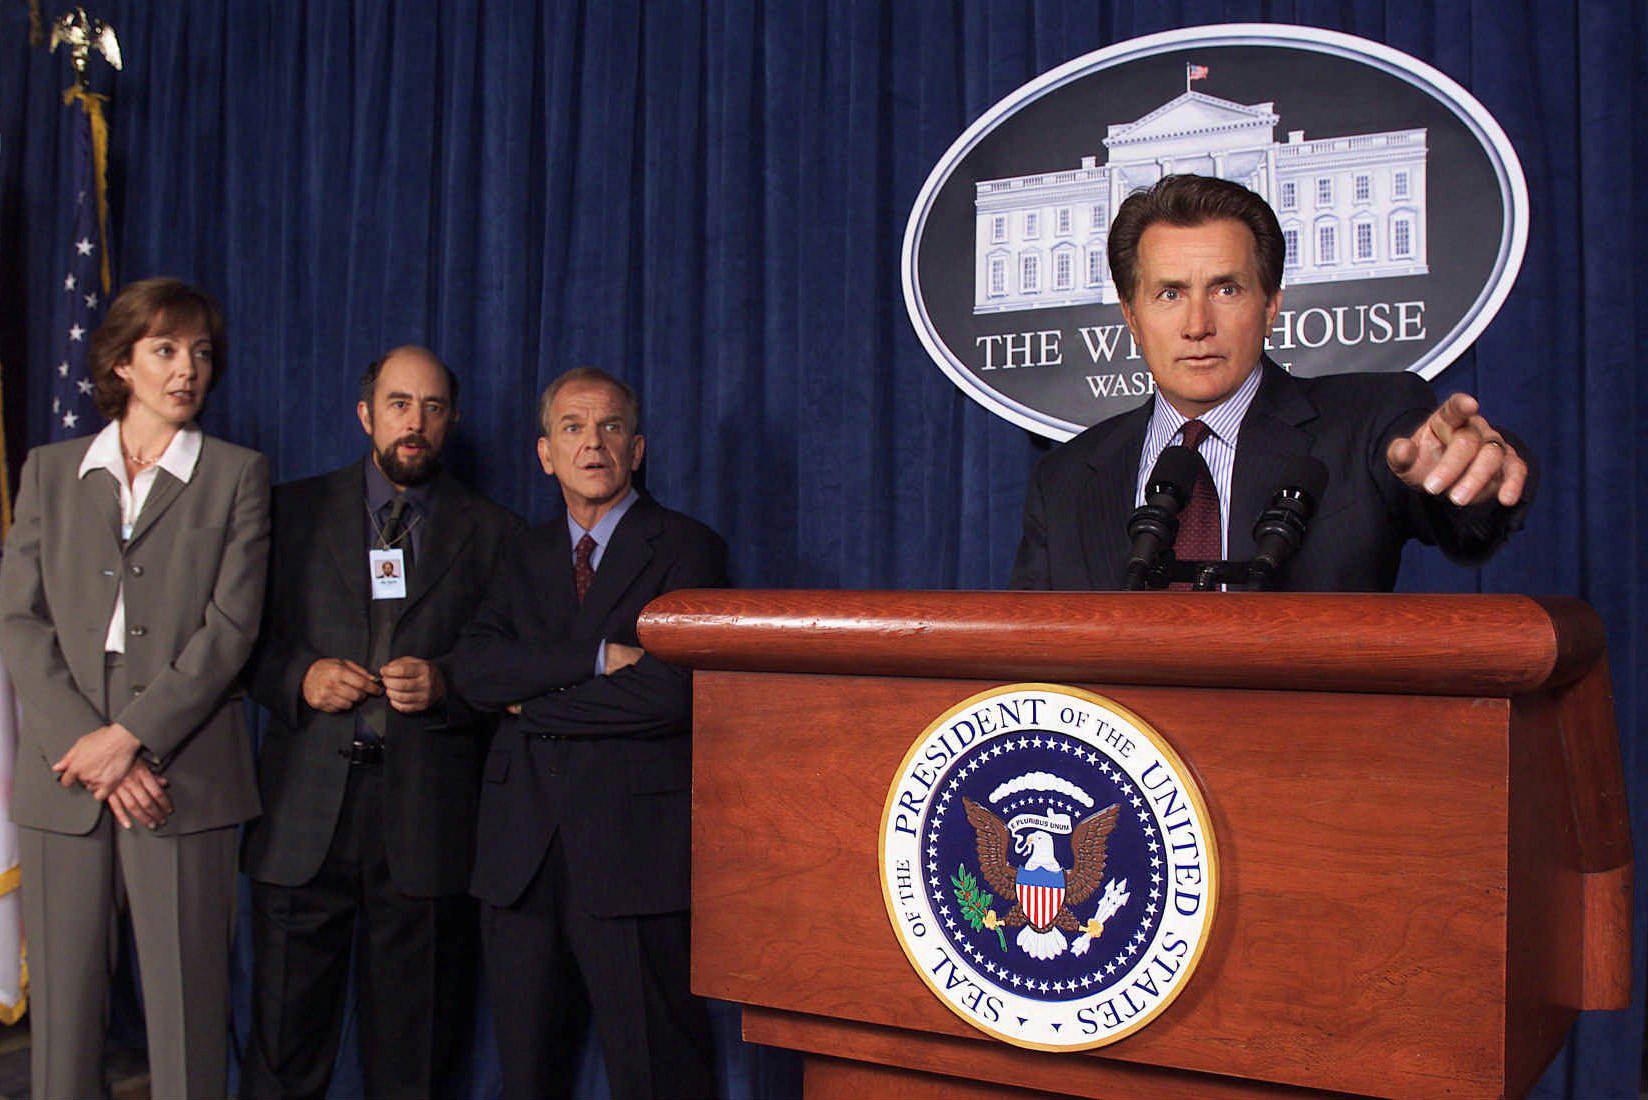 Martin Sheen playing President Josiah Bartlett in 'The West Wing.'